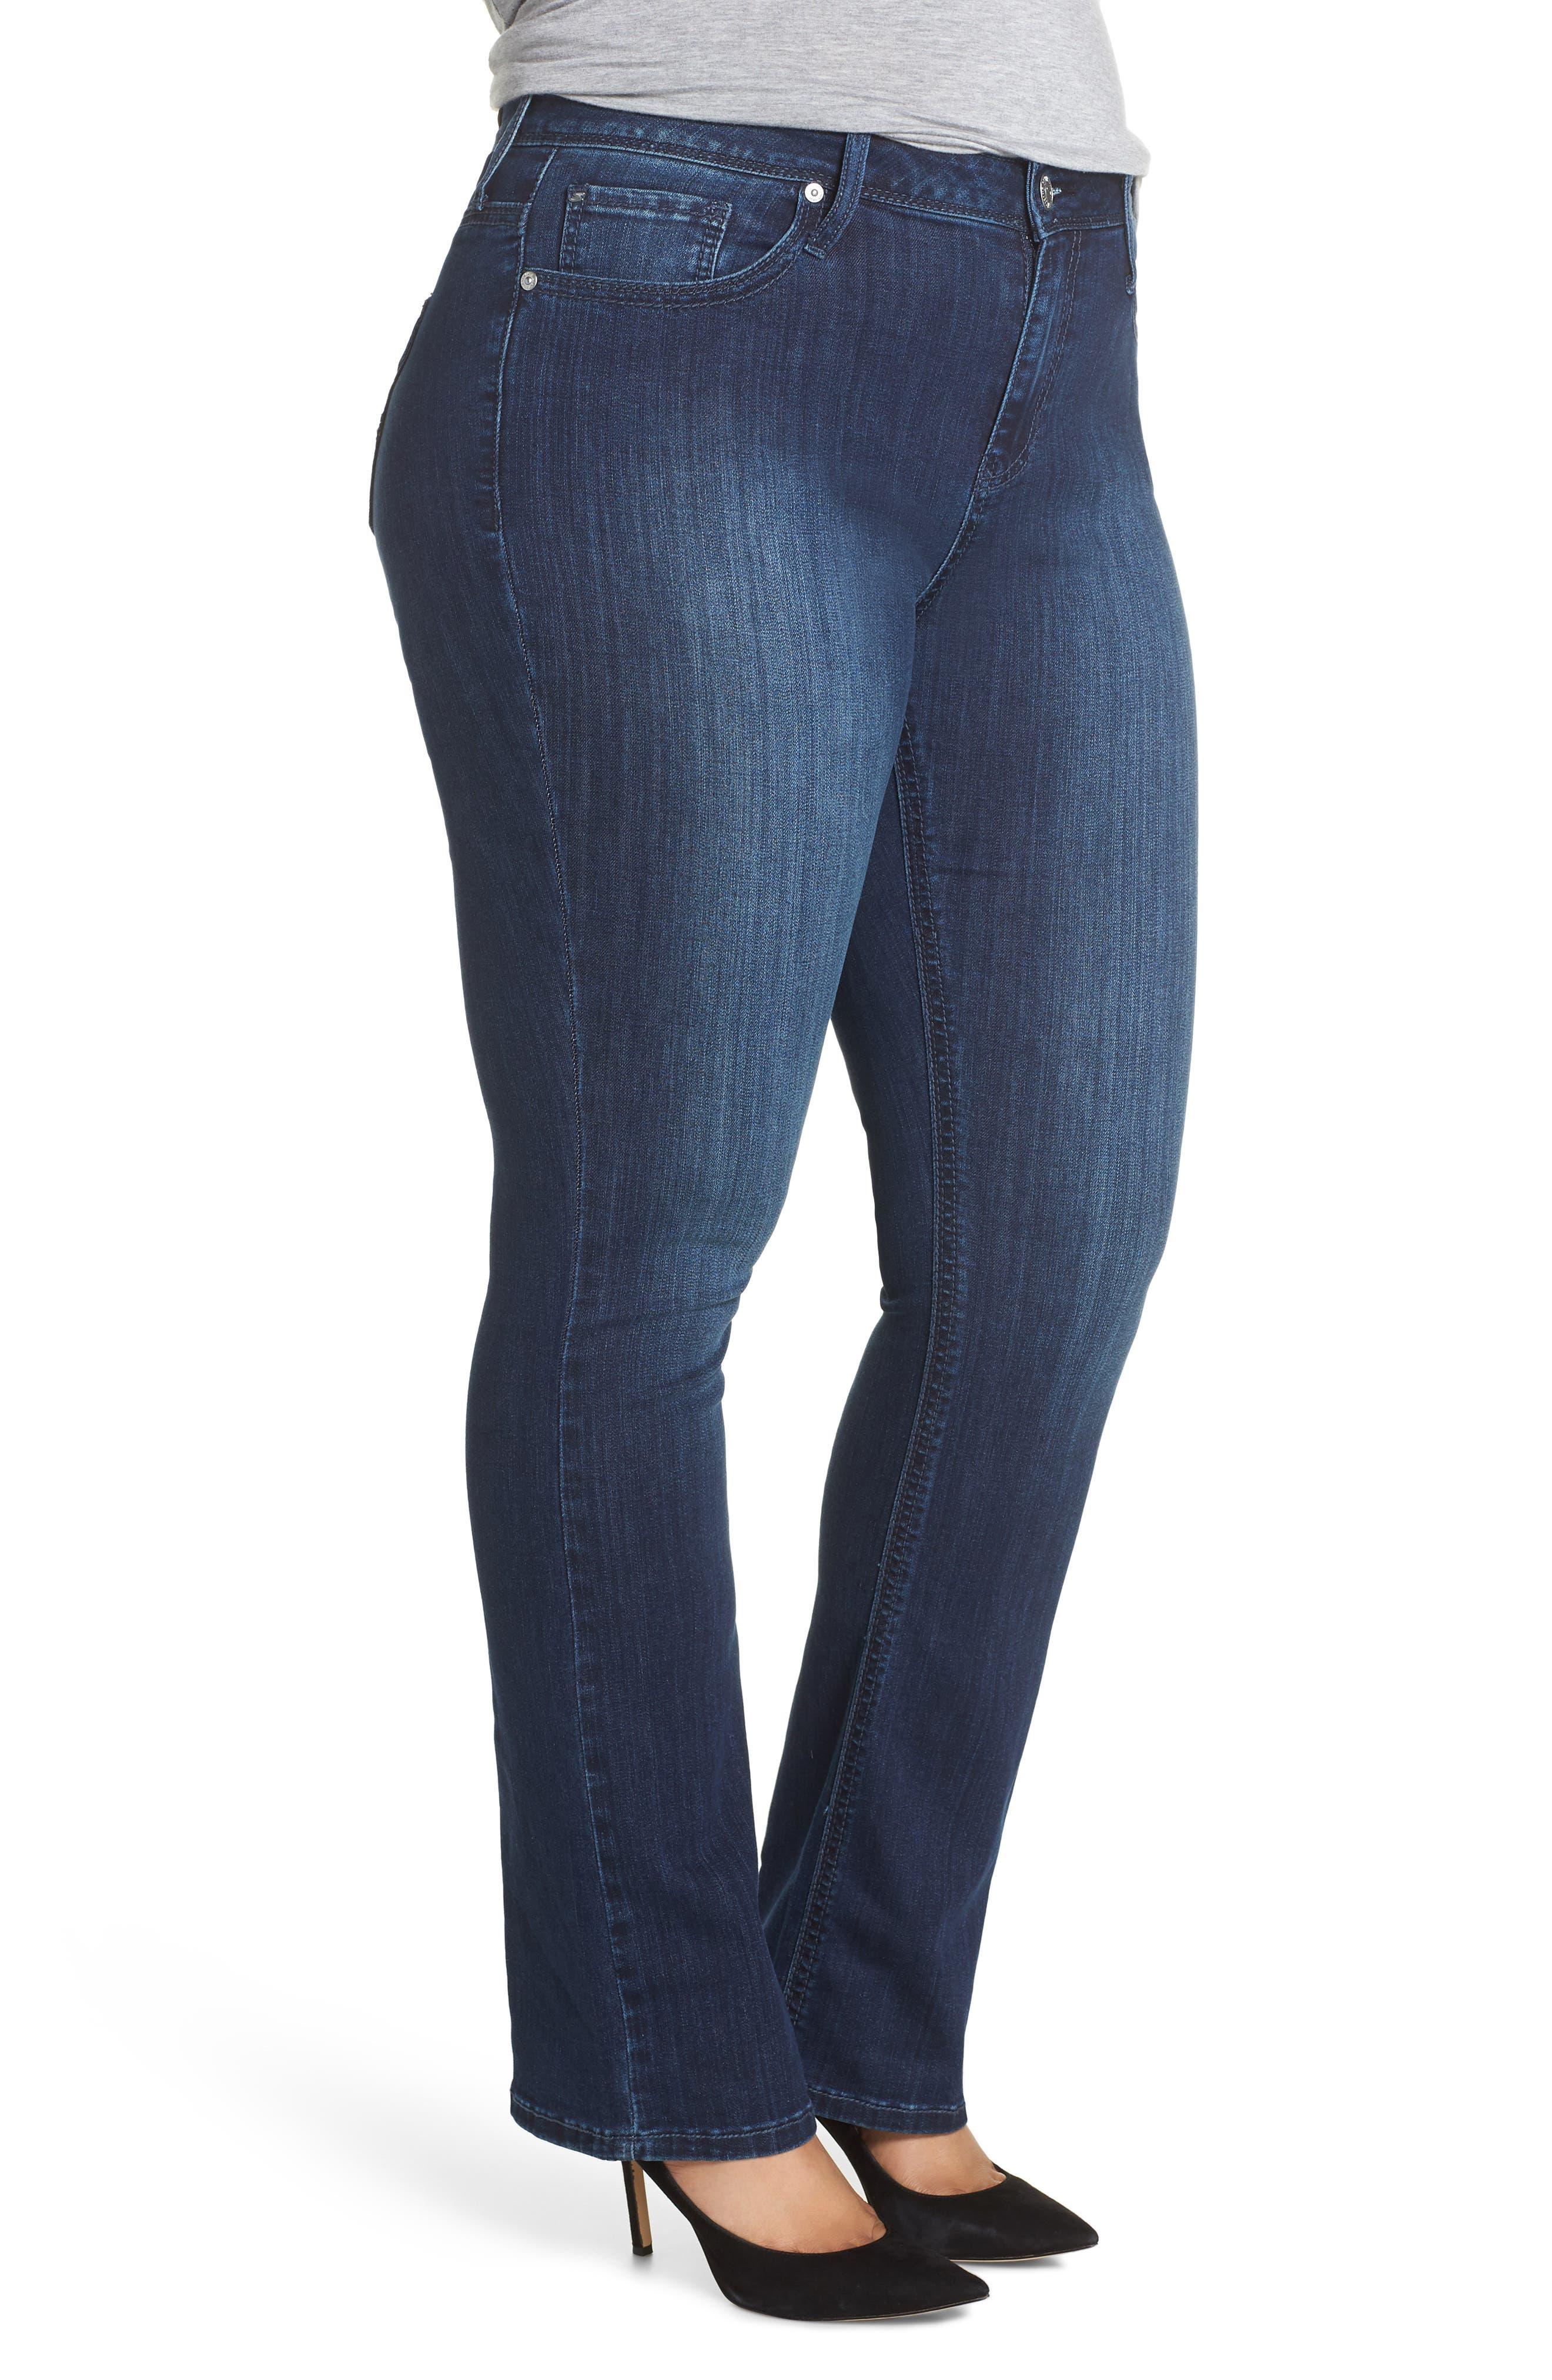 SEVEN7, Rocker Flap Pocket Slim Bootcut Jeans, Alternate thumbnail 4, color, CHALLENGER